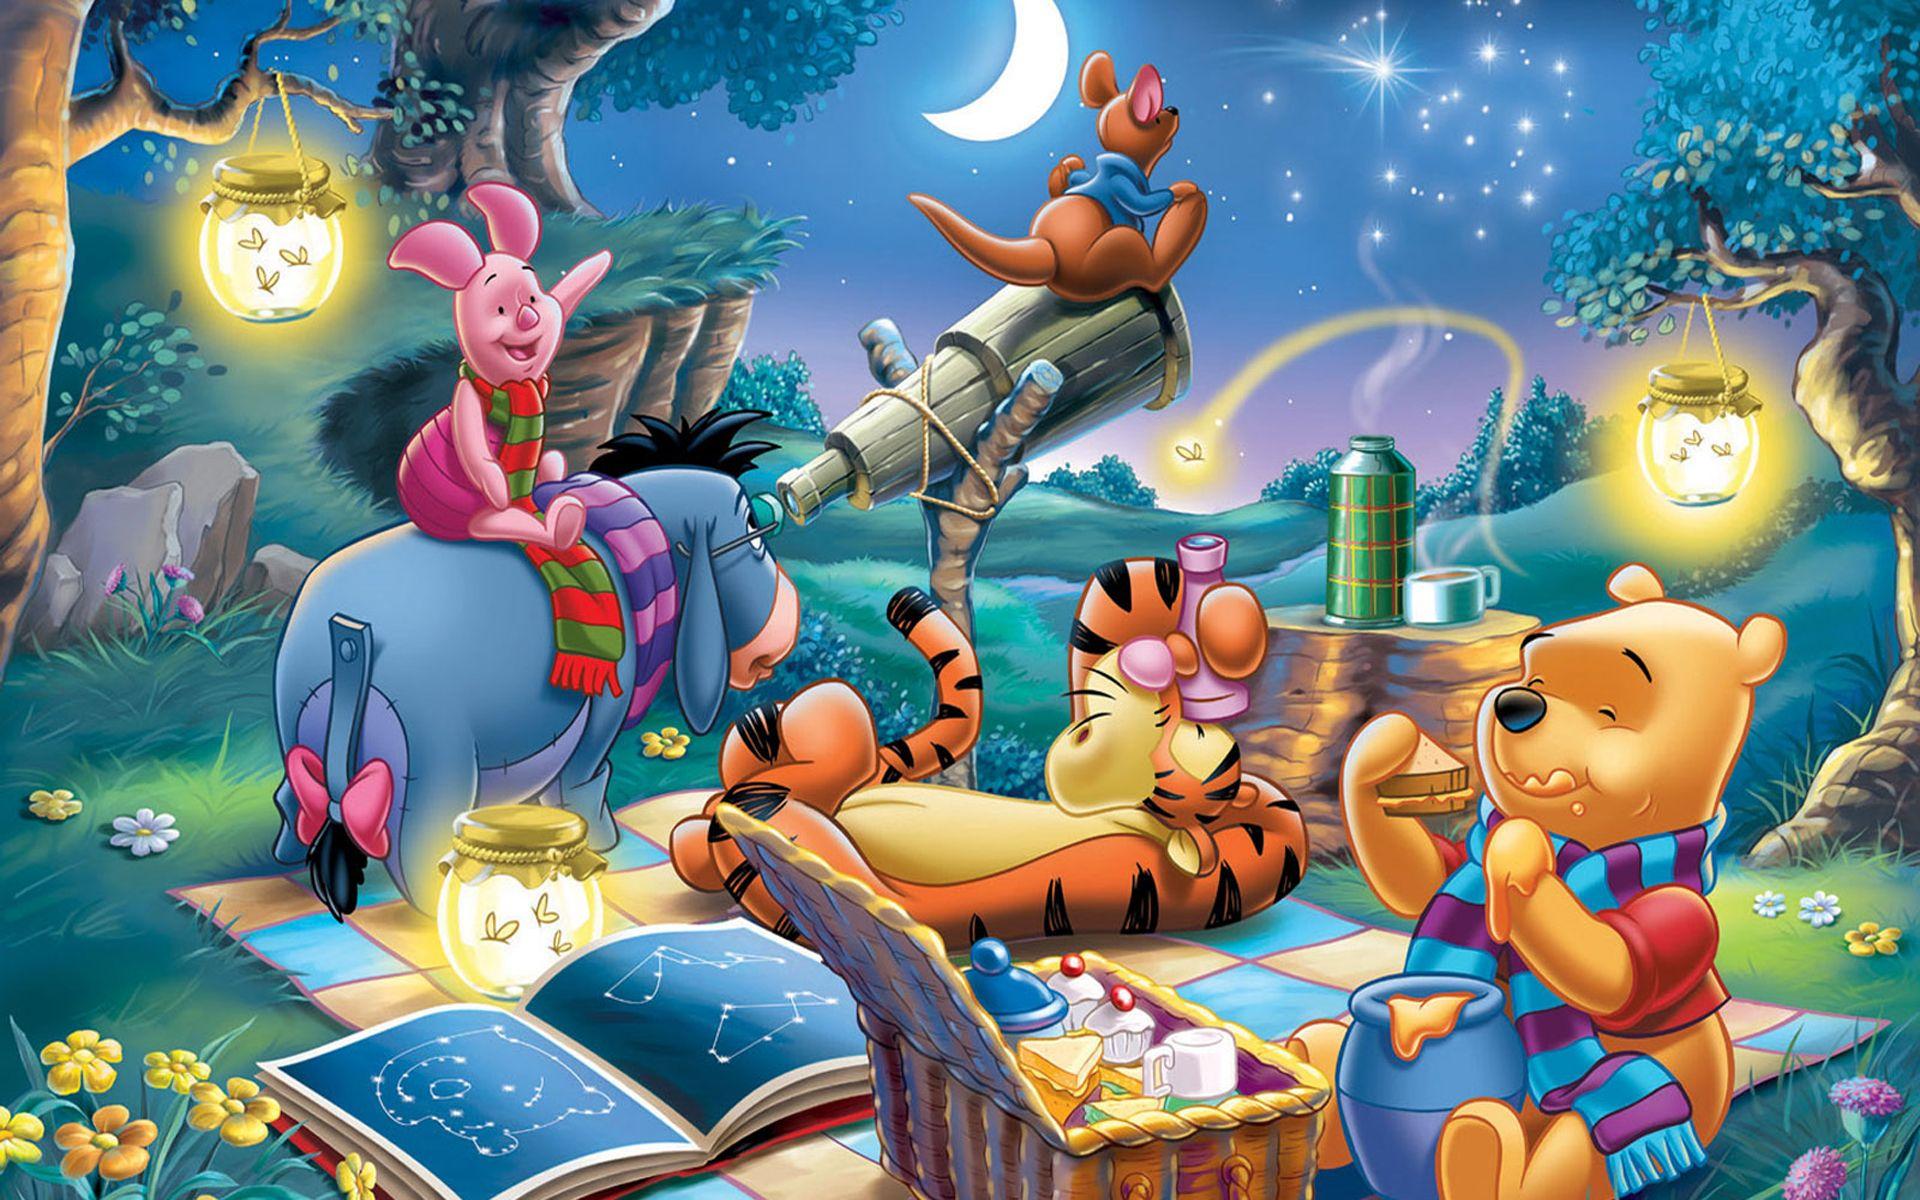 Billedresultat For Winnie The Pooh Night Night Pooh Amigos De Winnie The Pooh Imagenes De Winnie Pooh Winnie De Pooh